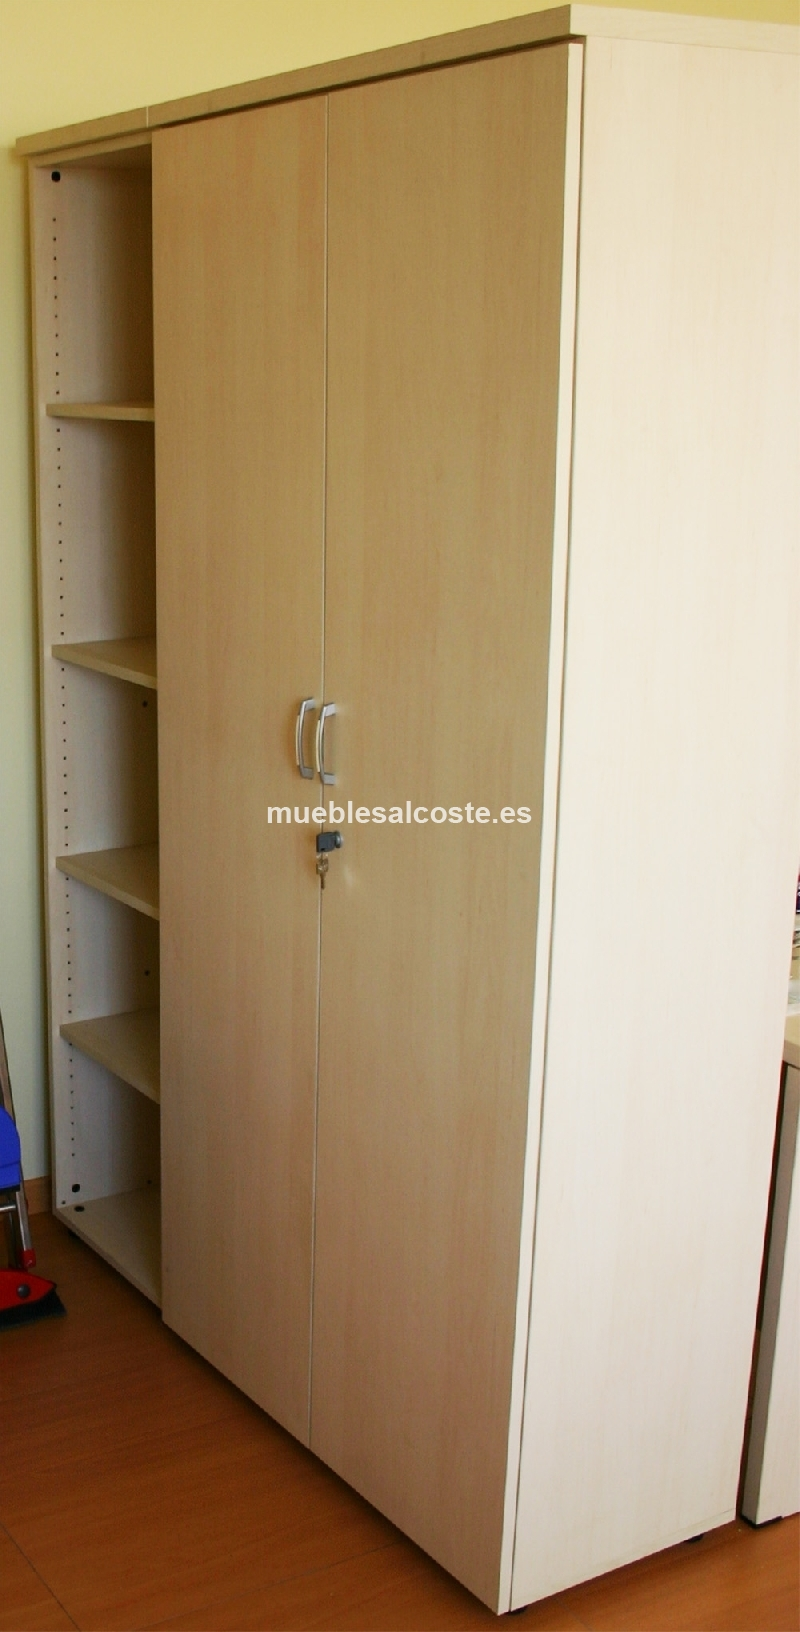 1 armario estanteria oficina 45x45cm cod 19761 segunda mano - Armario estanteria ...